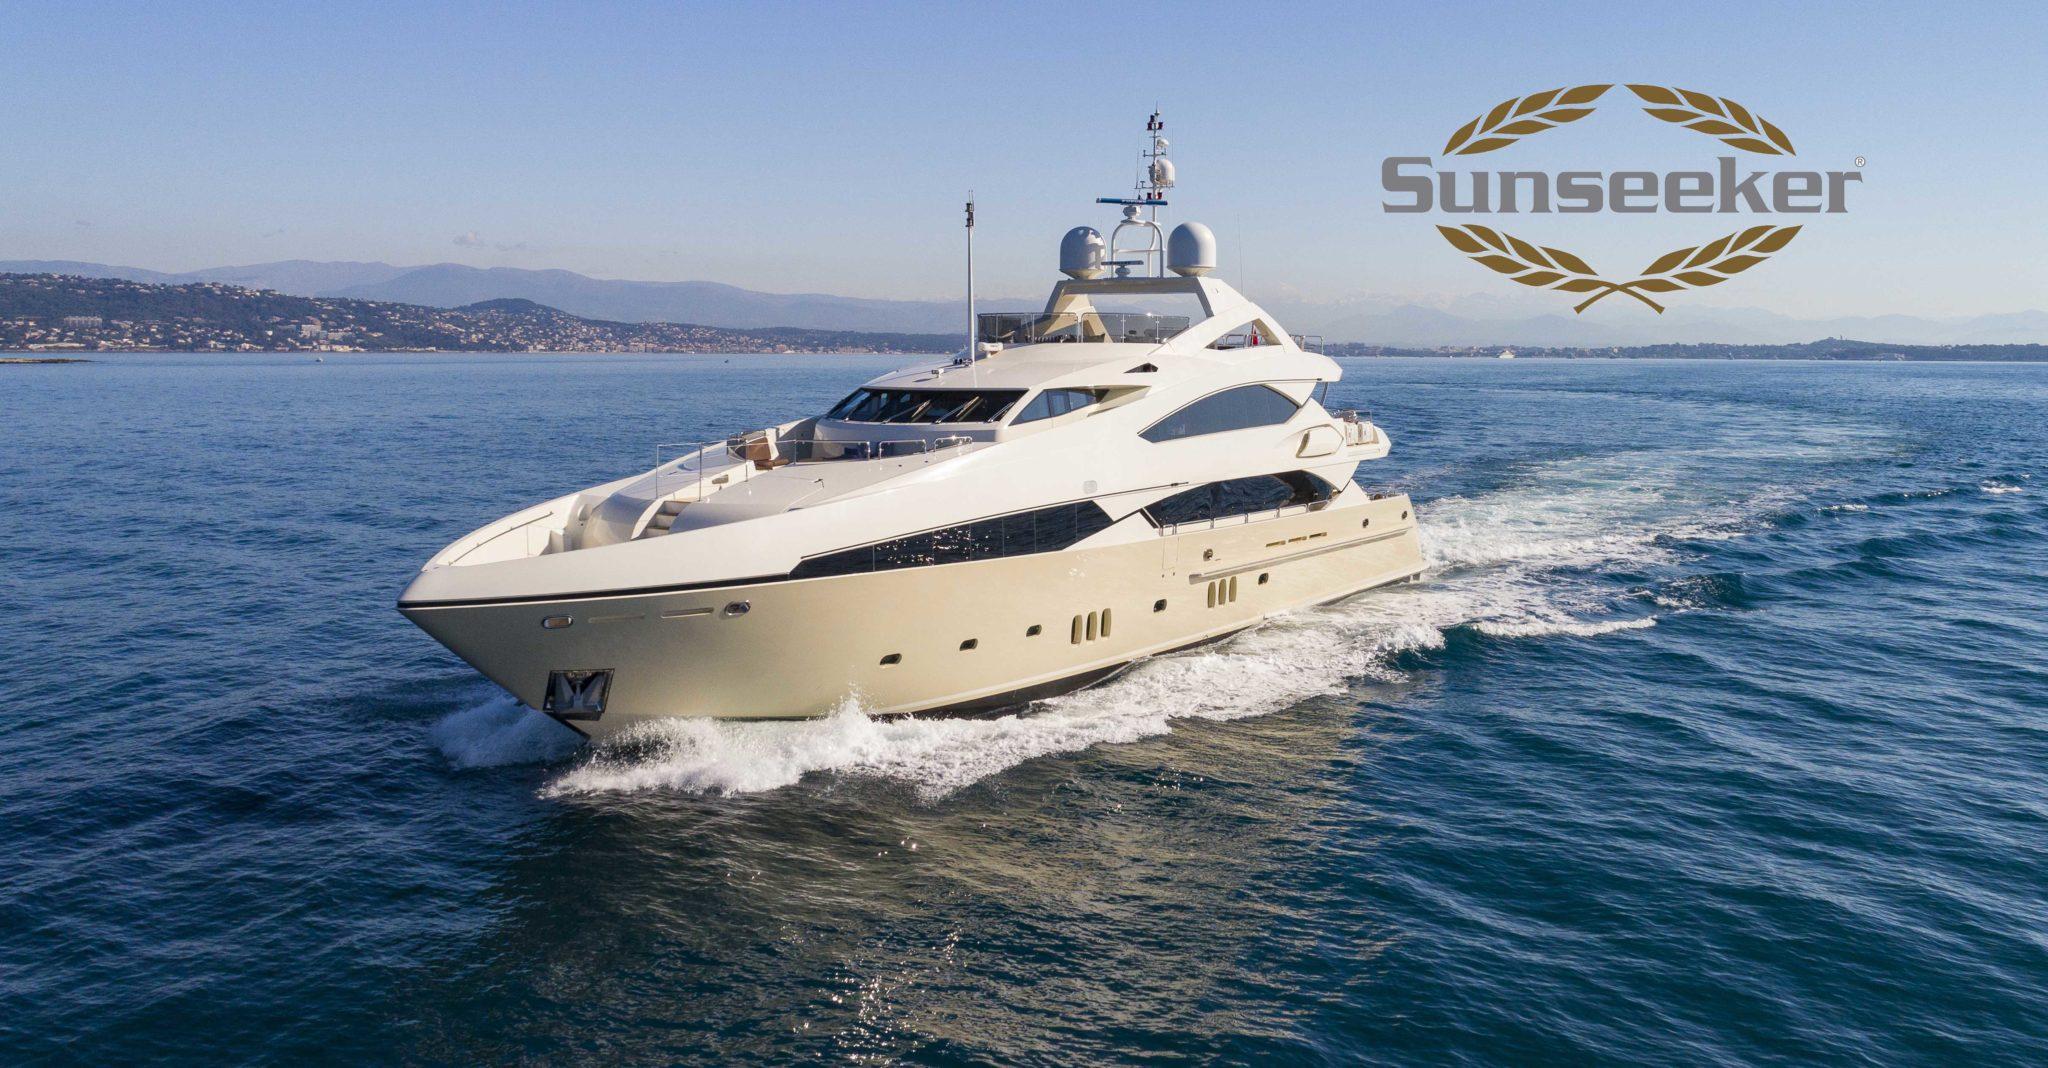 Sunseeker Yachts for Sale – James Bond's Top Picks